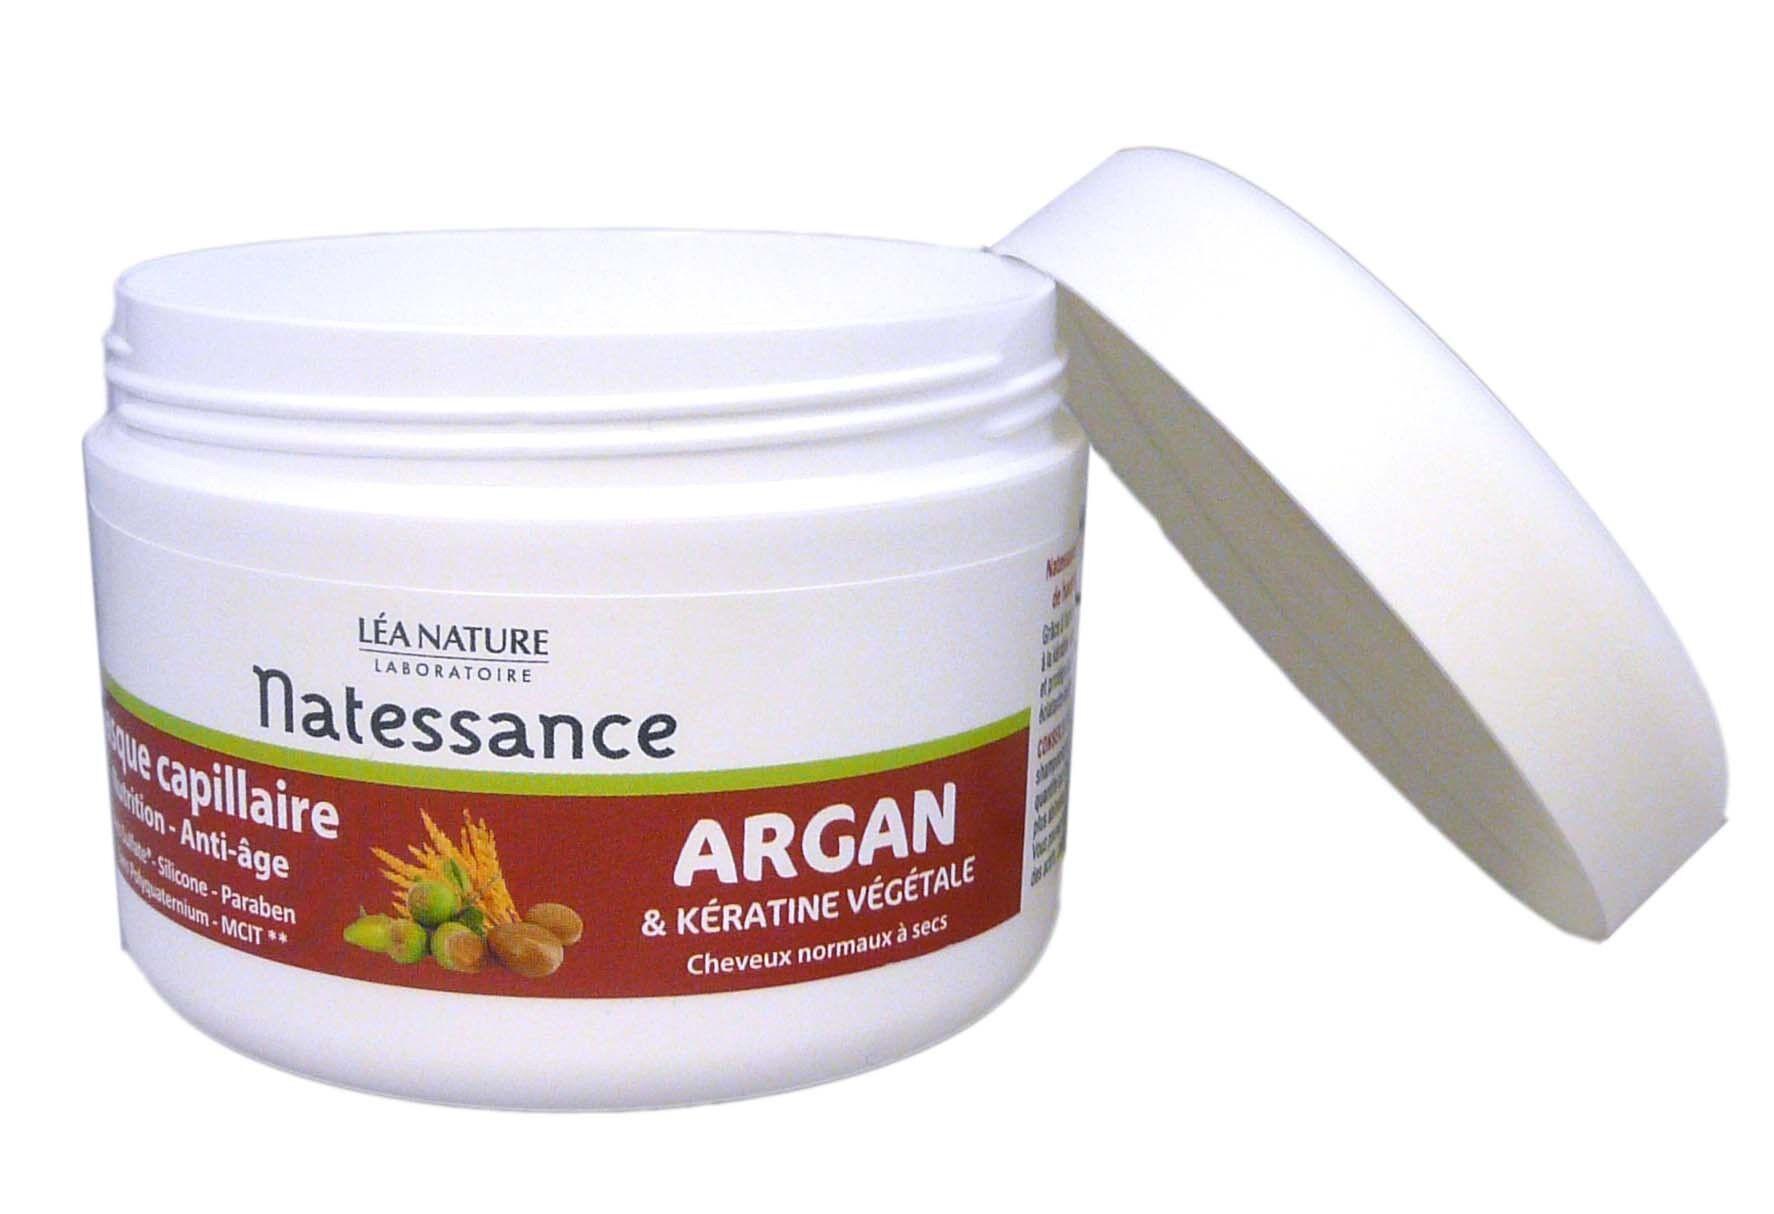 Natessance masque capillaire argan 200ml